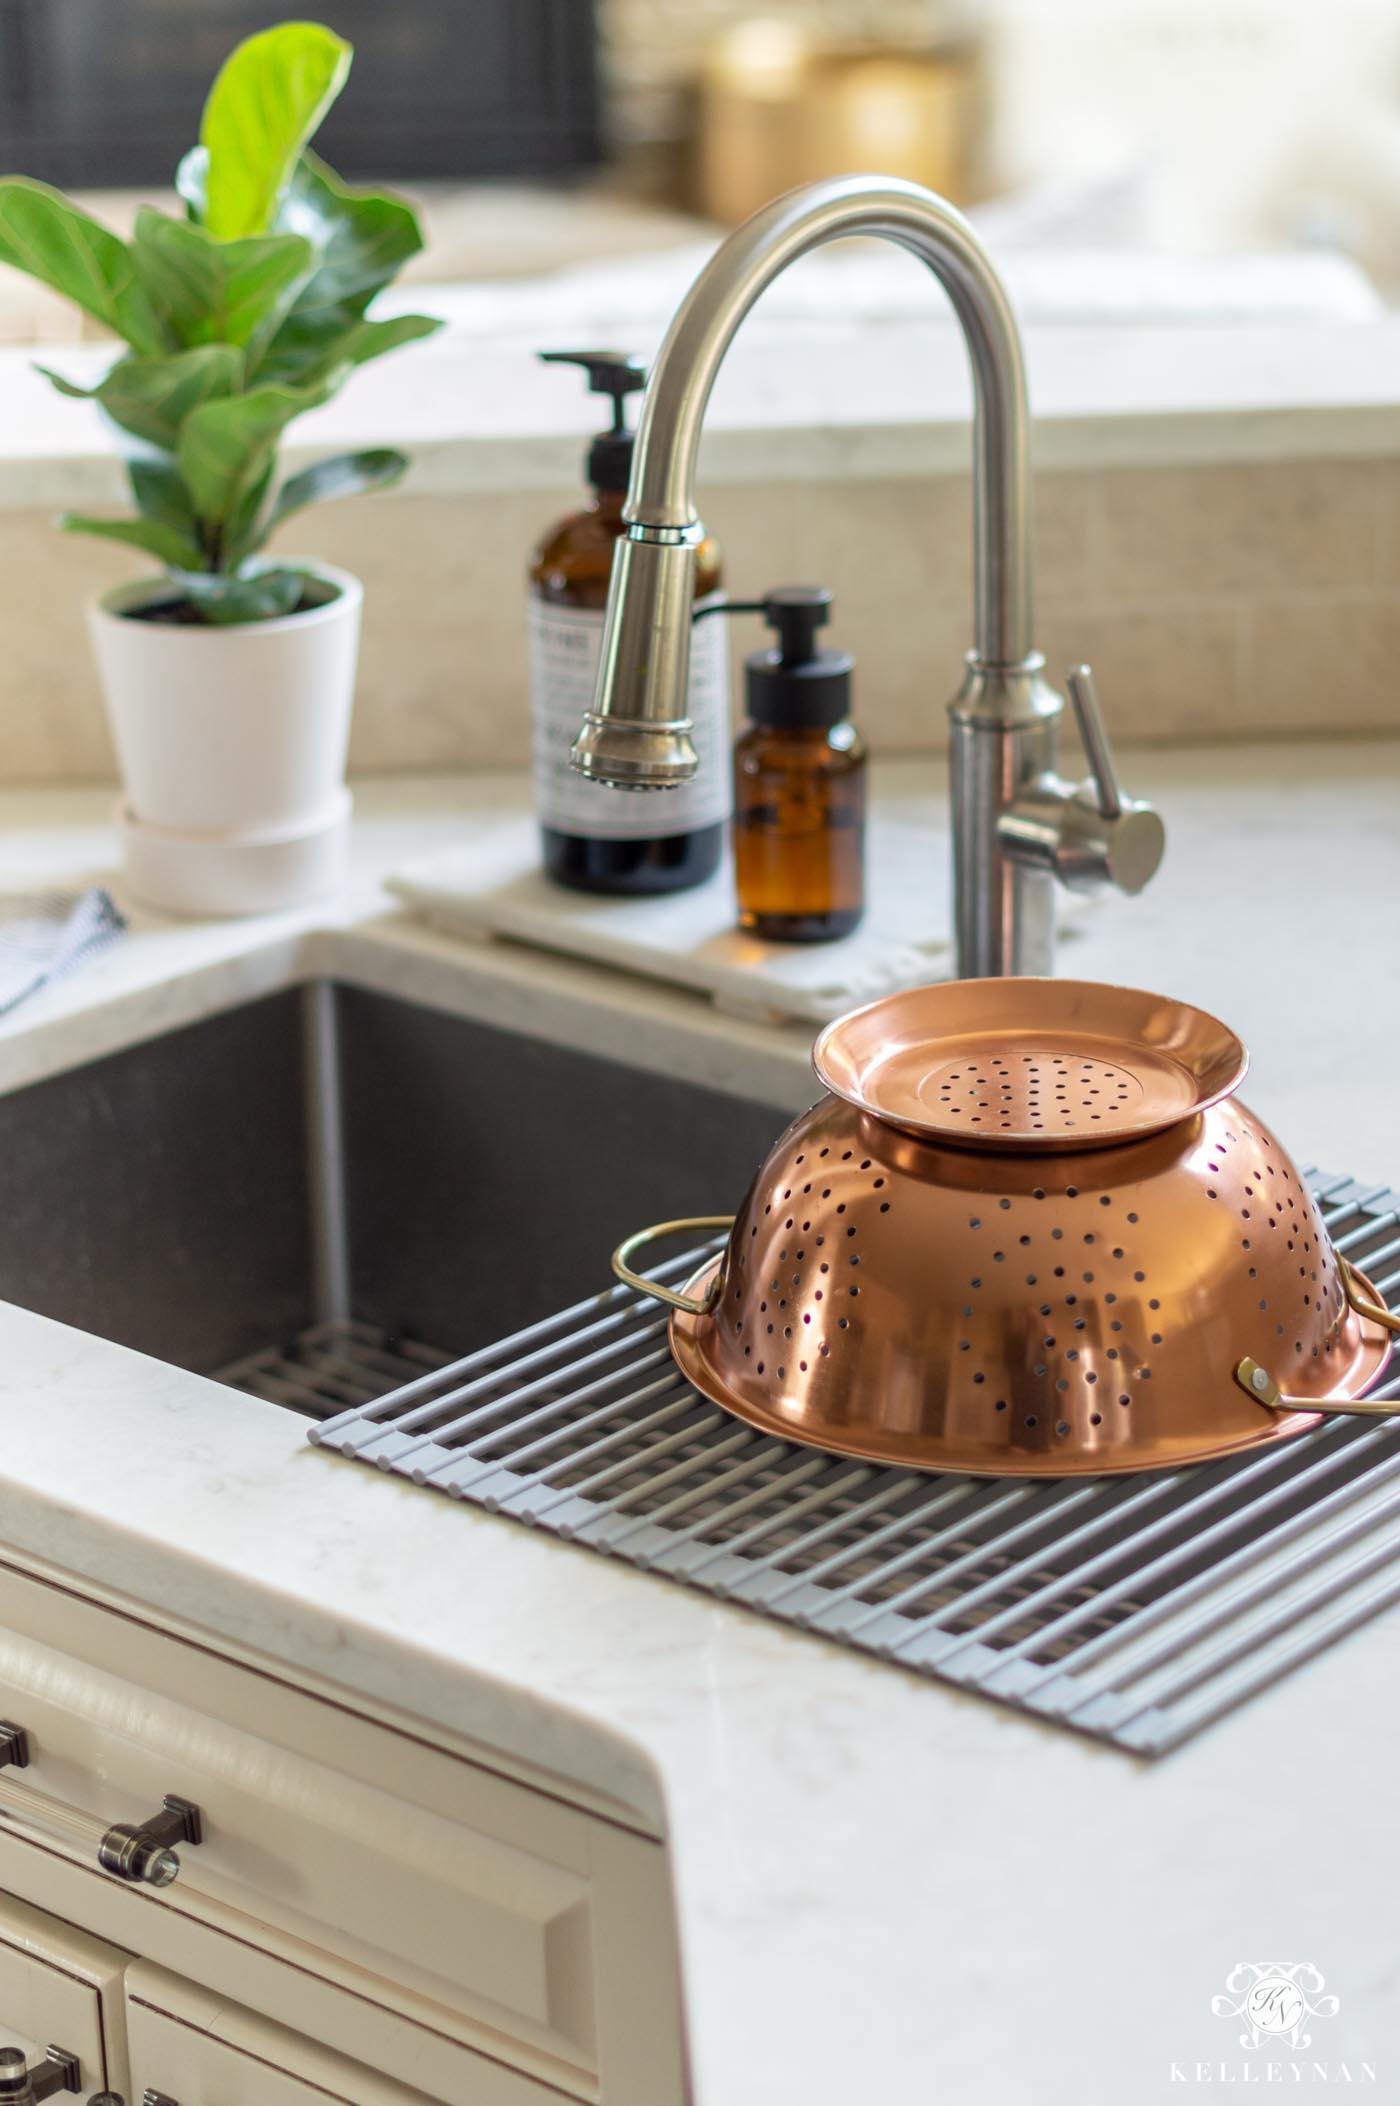 Favorite Kitchen Gadgets on Amazon